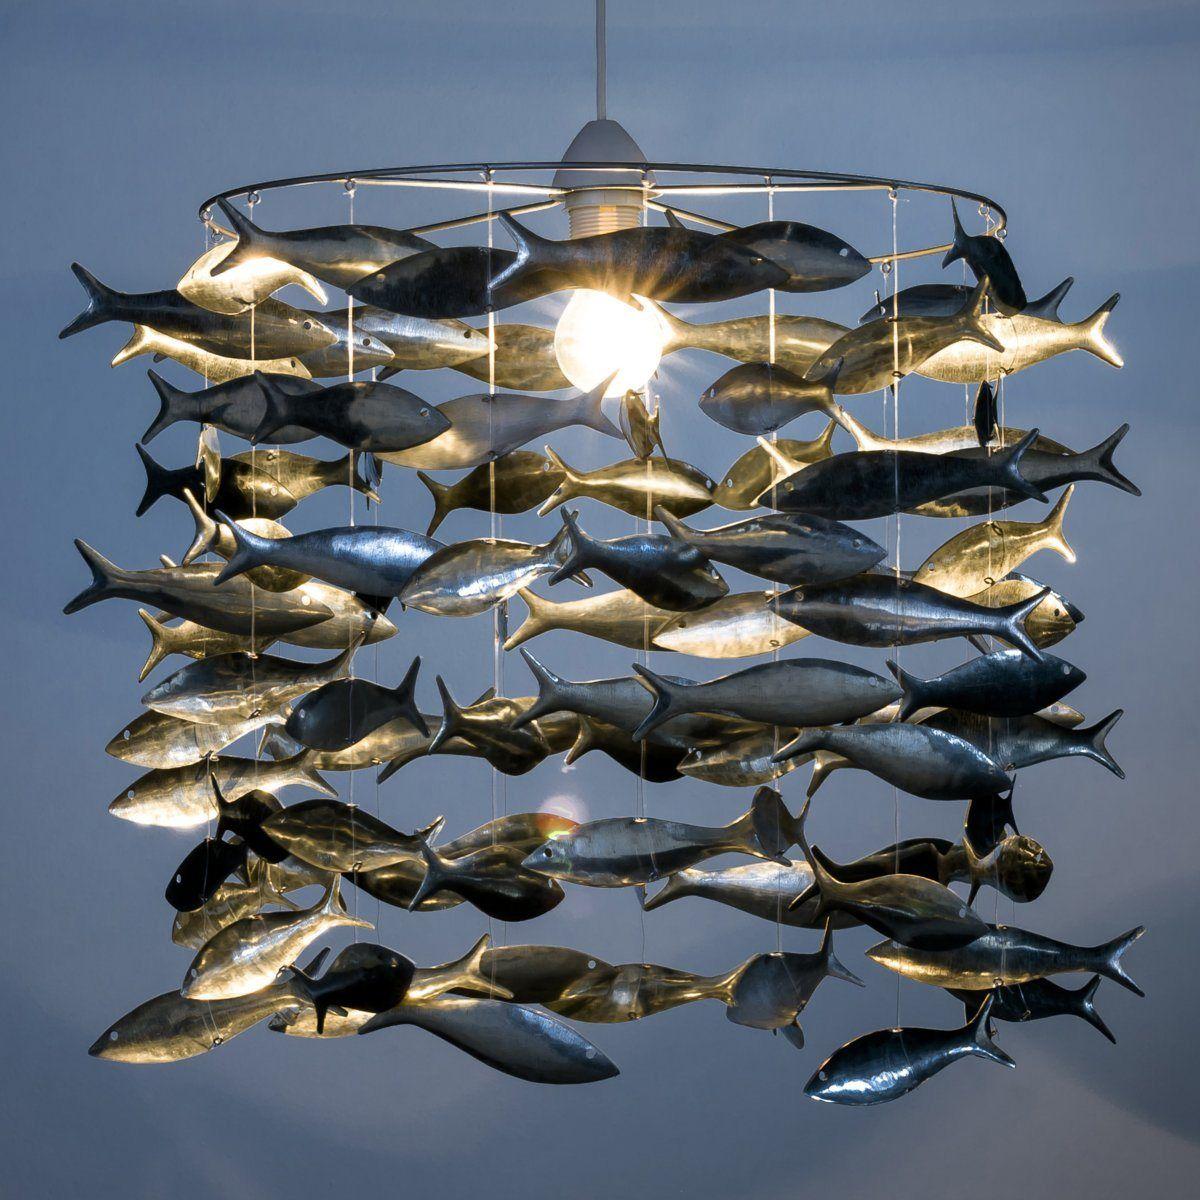 suspension poissons fish pinterest suspension poissons et luminaires. Black Bedroom Furniture Sets. Home Design Ideas